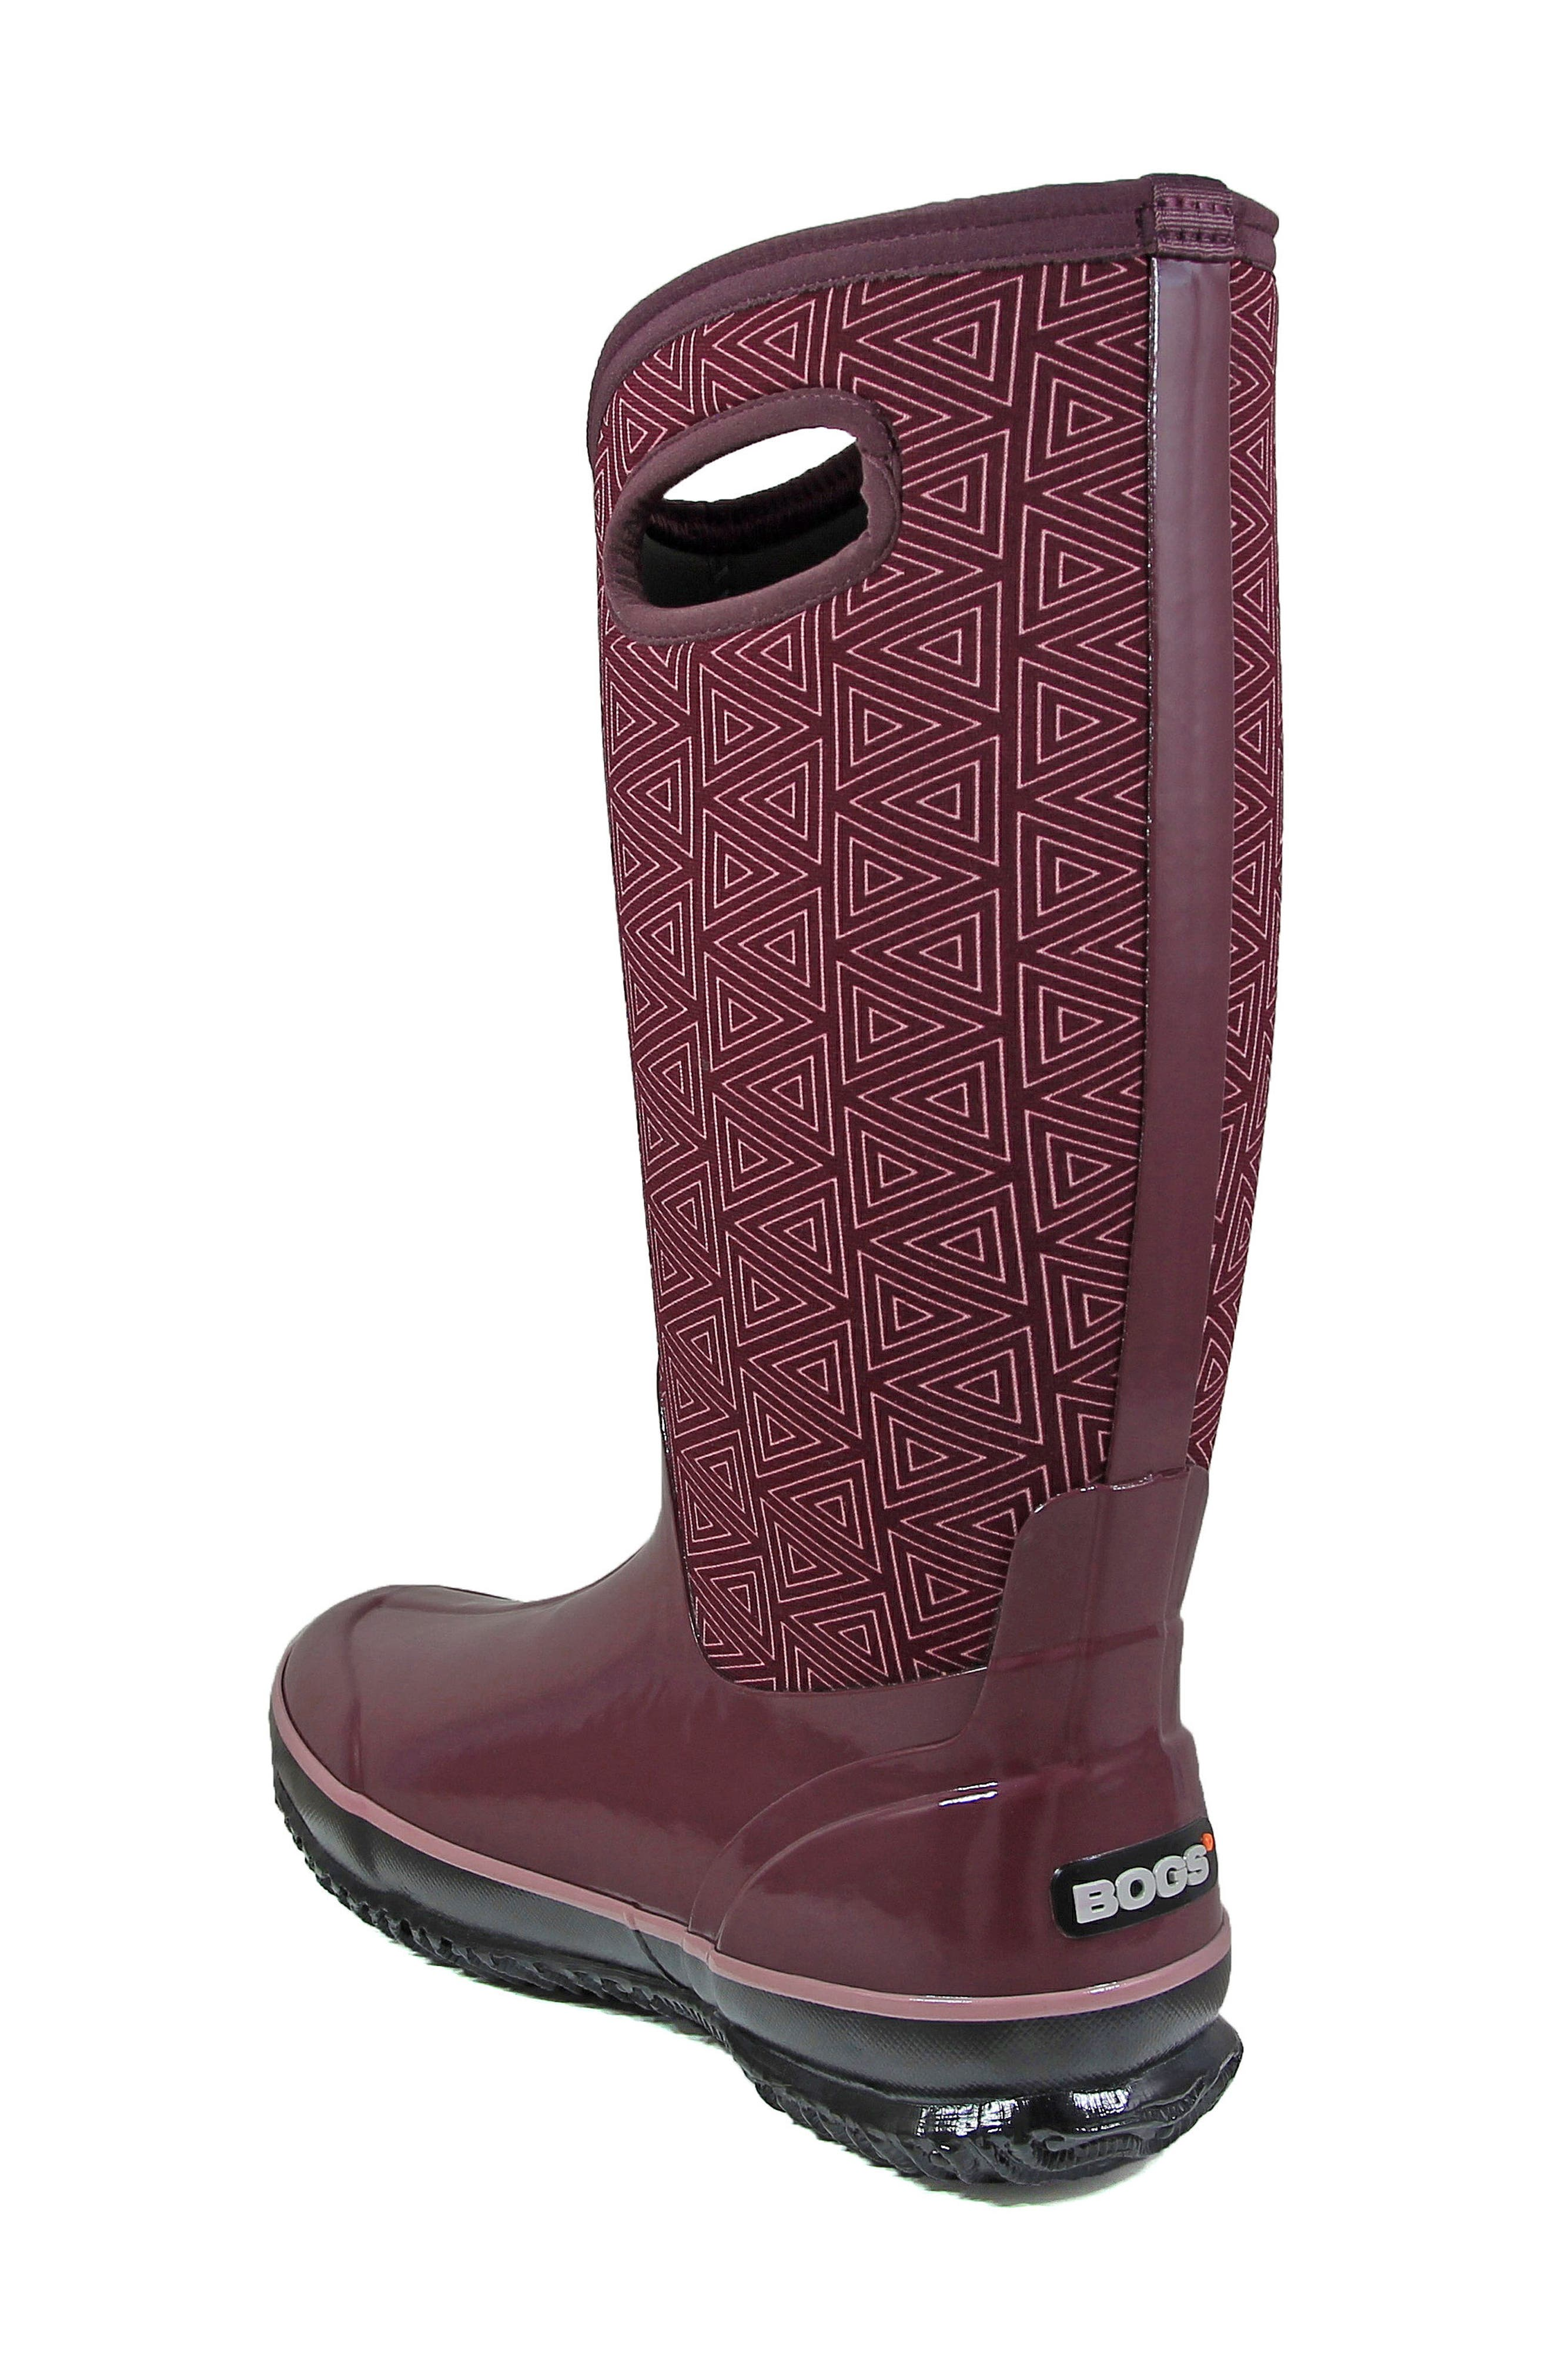 Alternate Image 2  - Bogs Classic Triangles Waterproof Subzero Insulated Boot (Women)